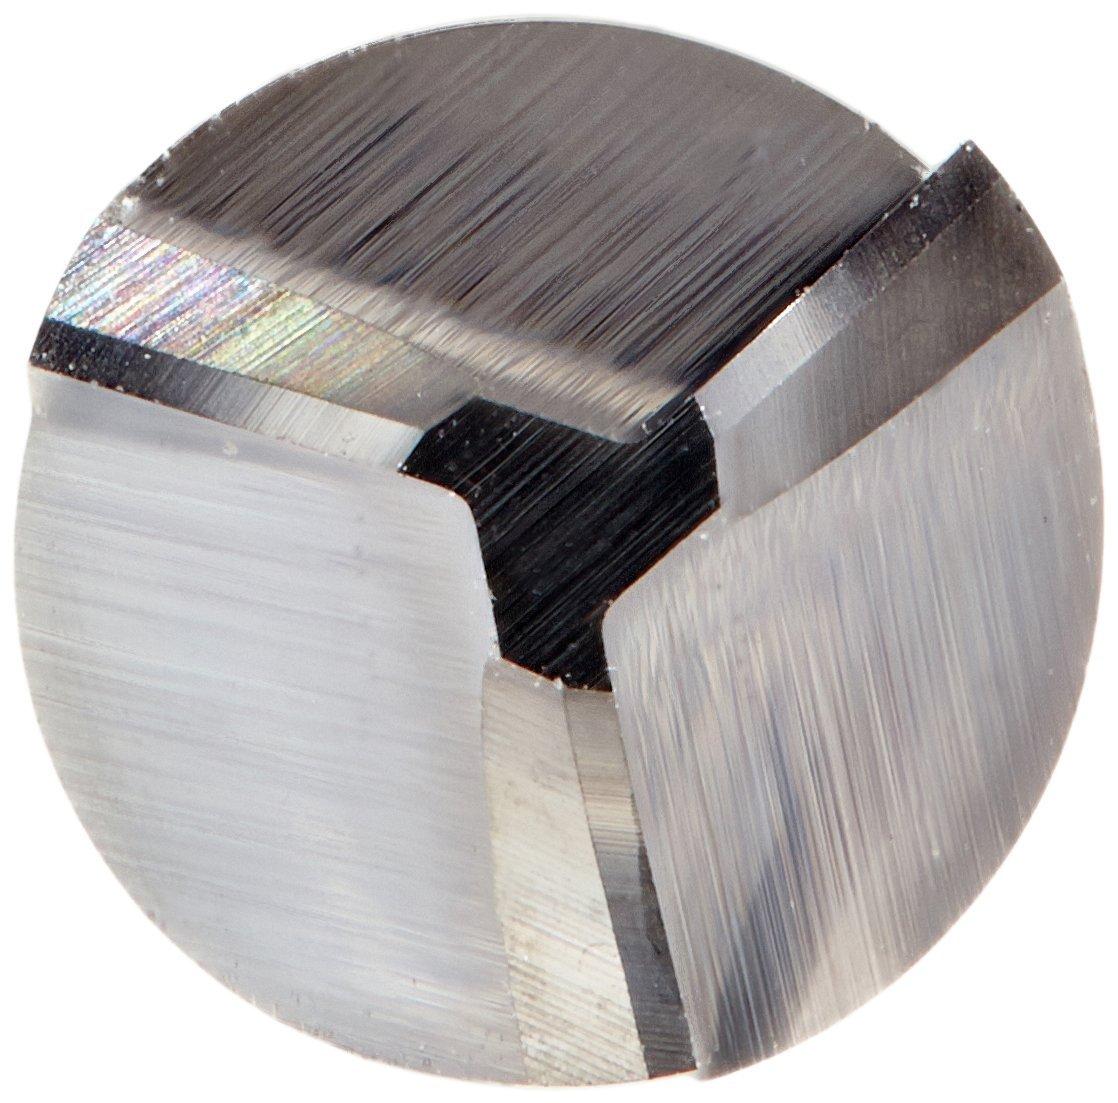 2 Overall Length 0.060 Minor Diameter 0.0550 Radius Solid Carbide Tool Micro 100 CRE-187-055 3 Flute Corner Rounding Double End Mill 3//16 Shank Diameter